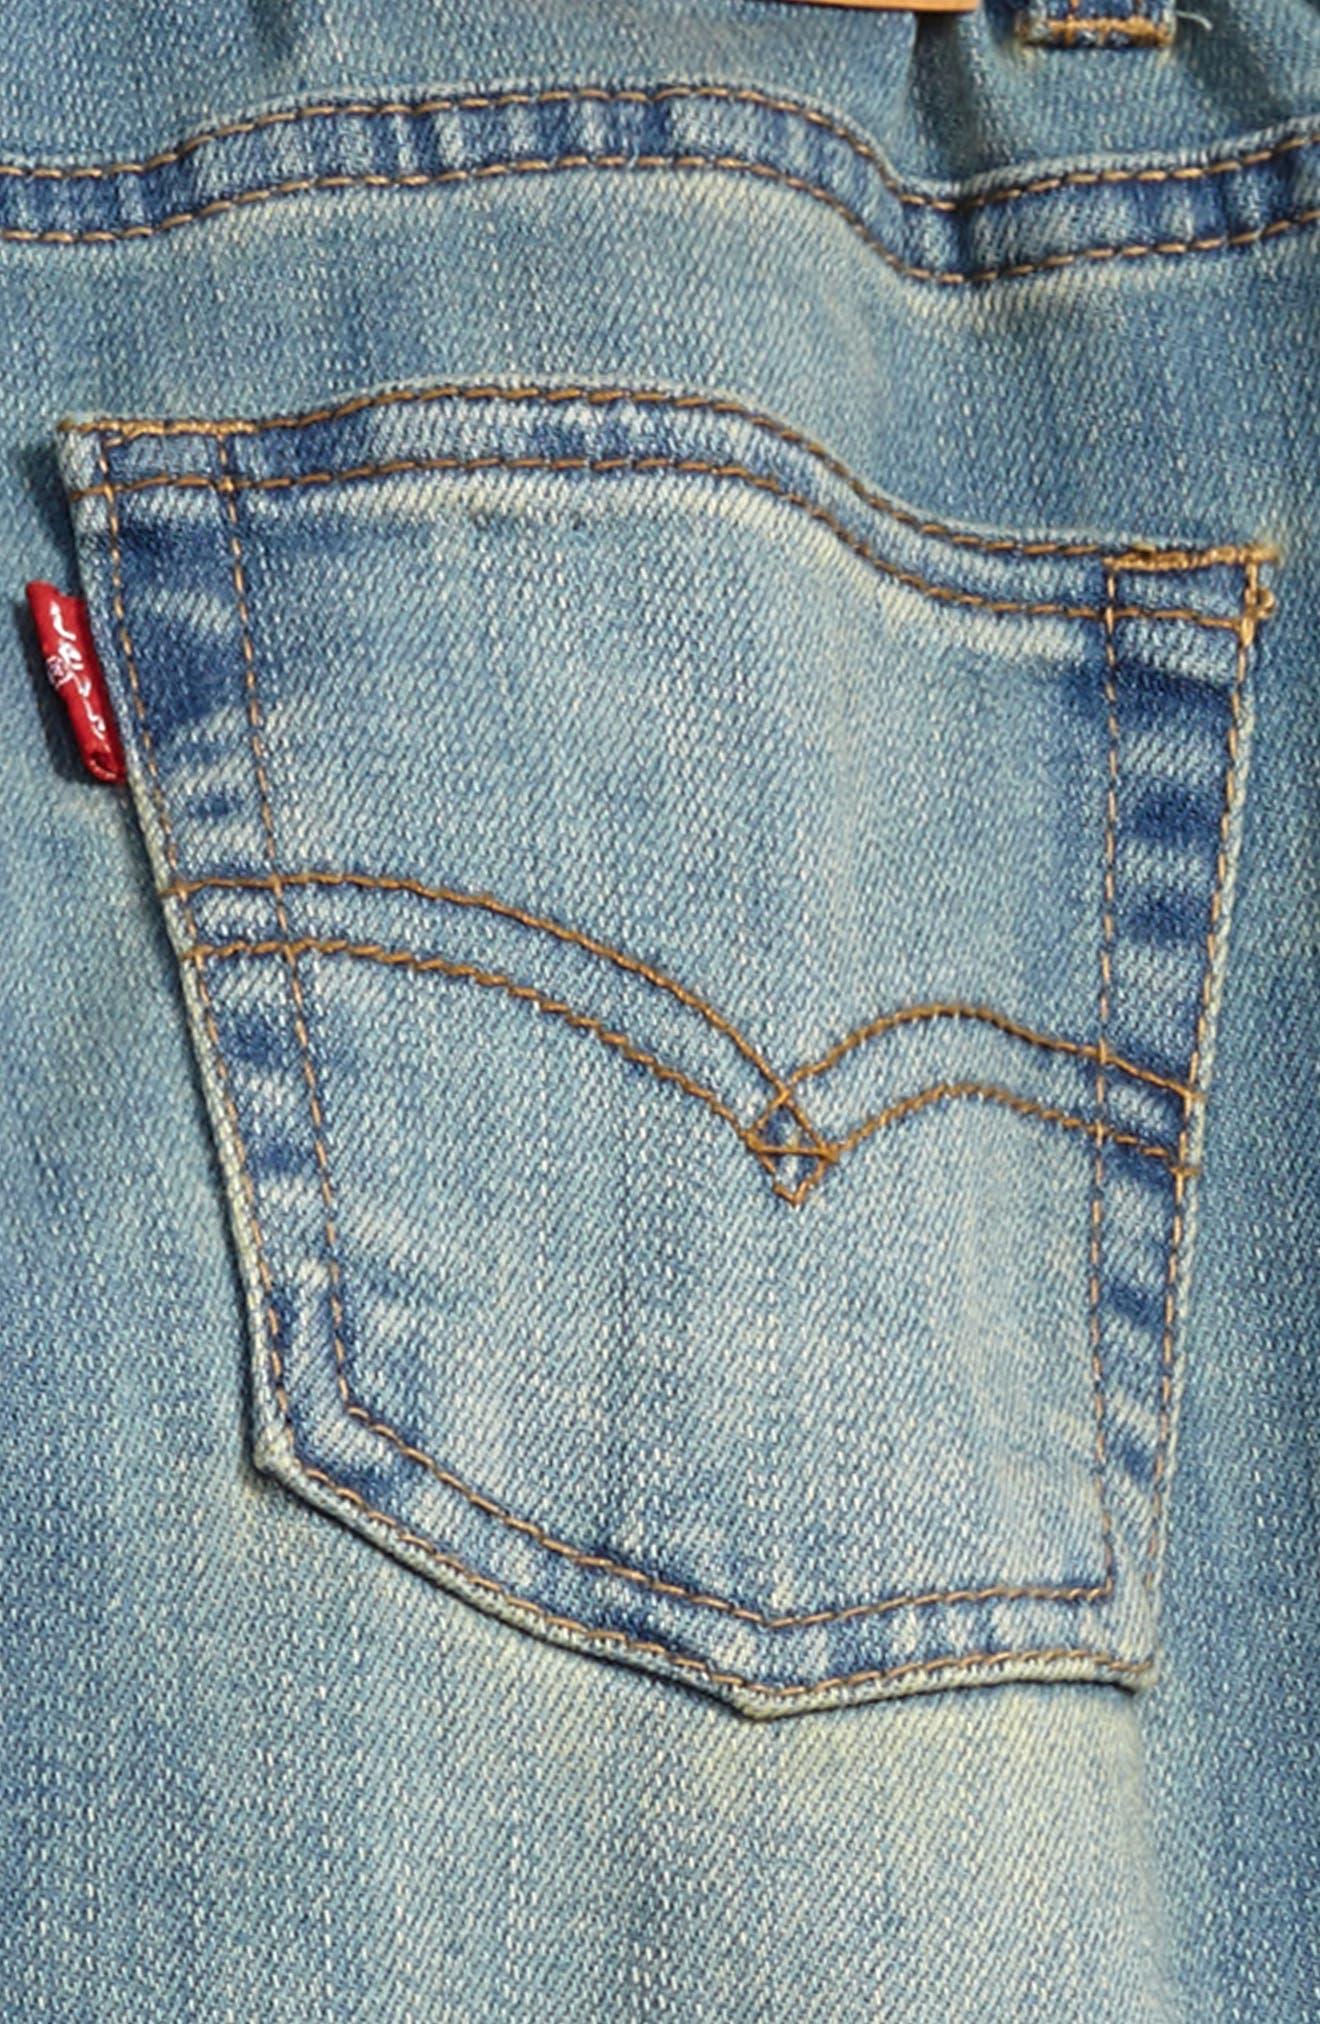 Comfort Slim Fit Jeans,                             Alternate thumbnail 3, color,